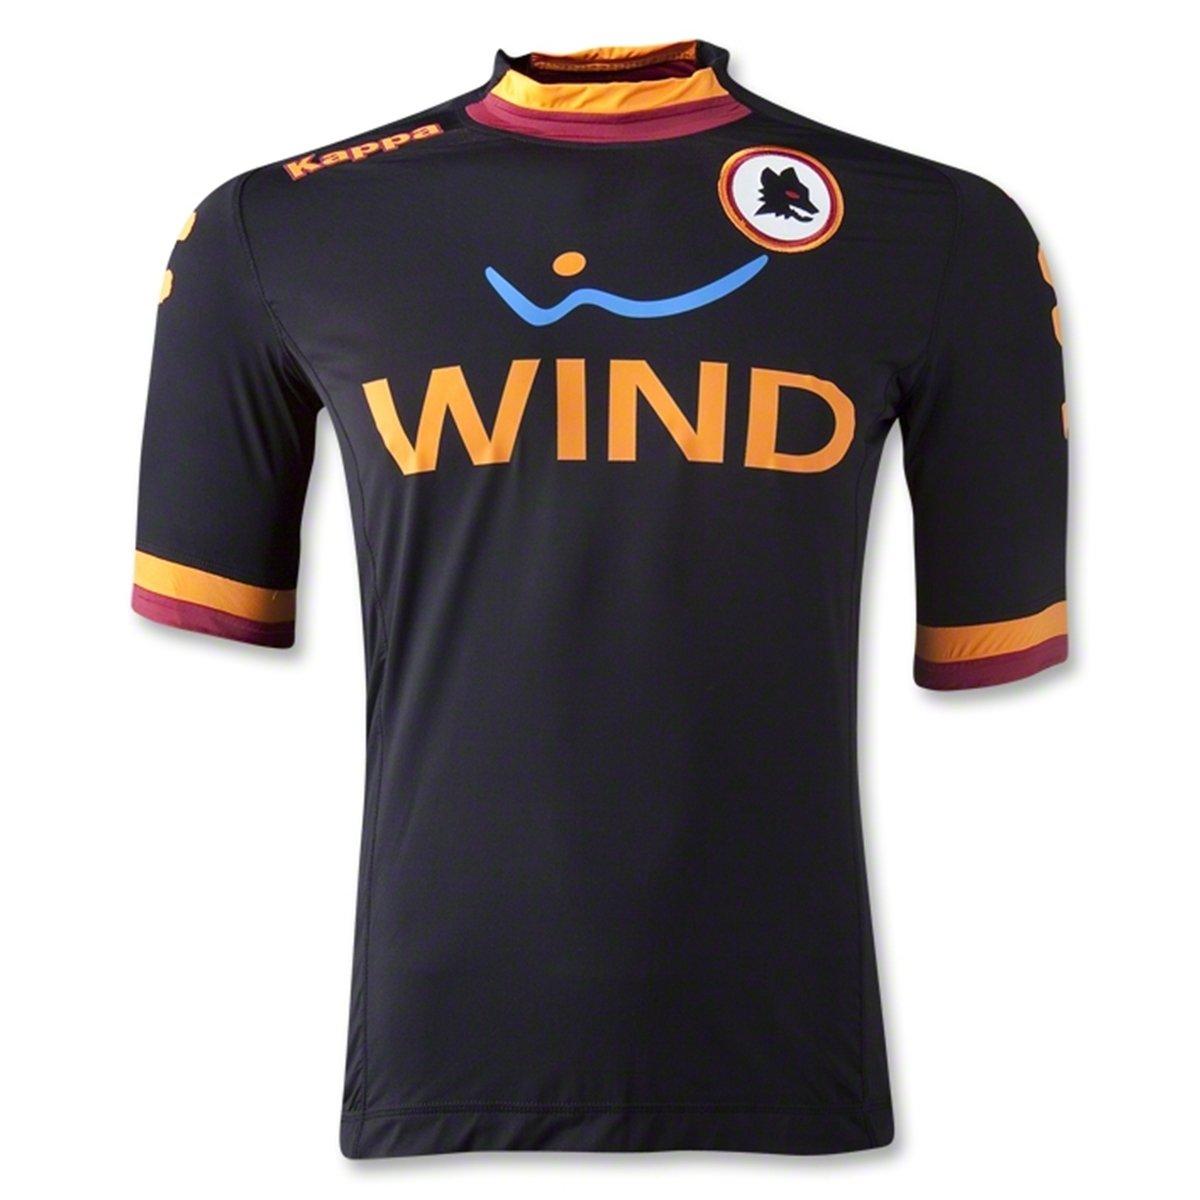 Kappa 2012-13 Roma 3rd Football Soccer T-Shirt Maglia